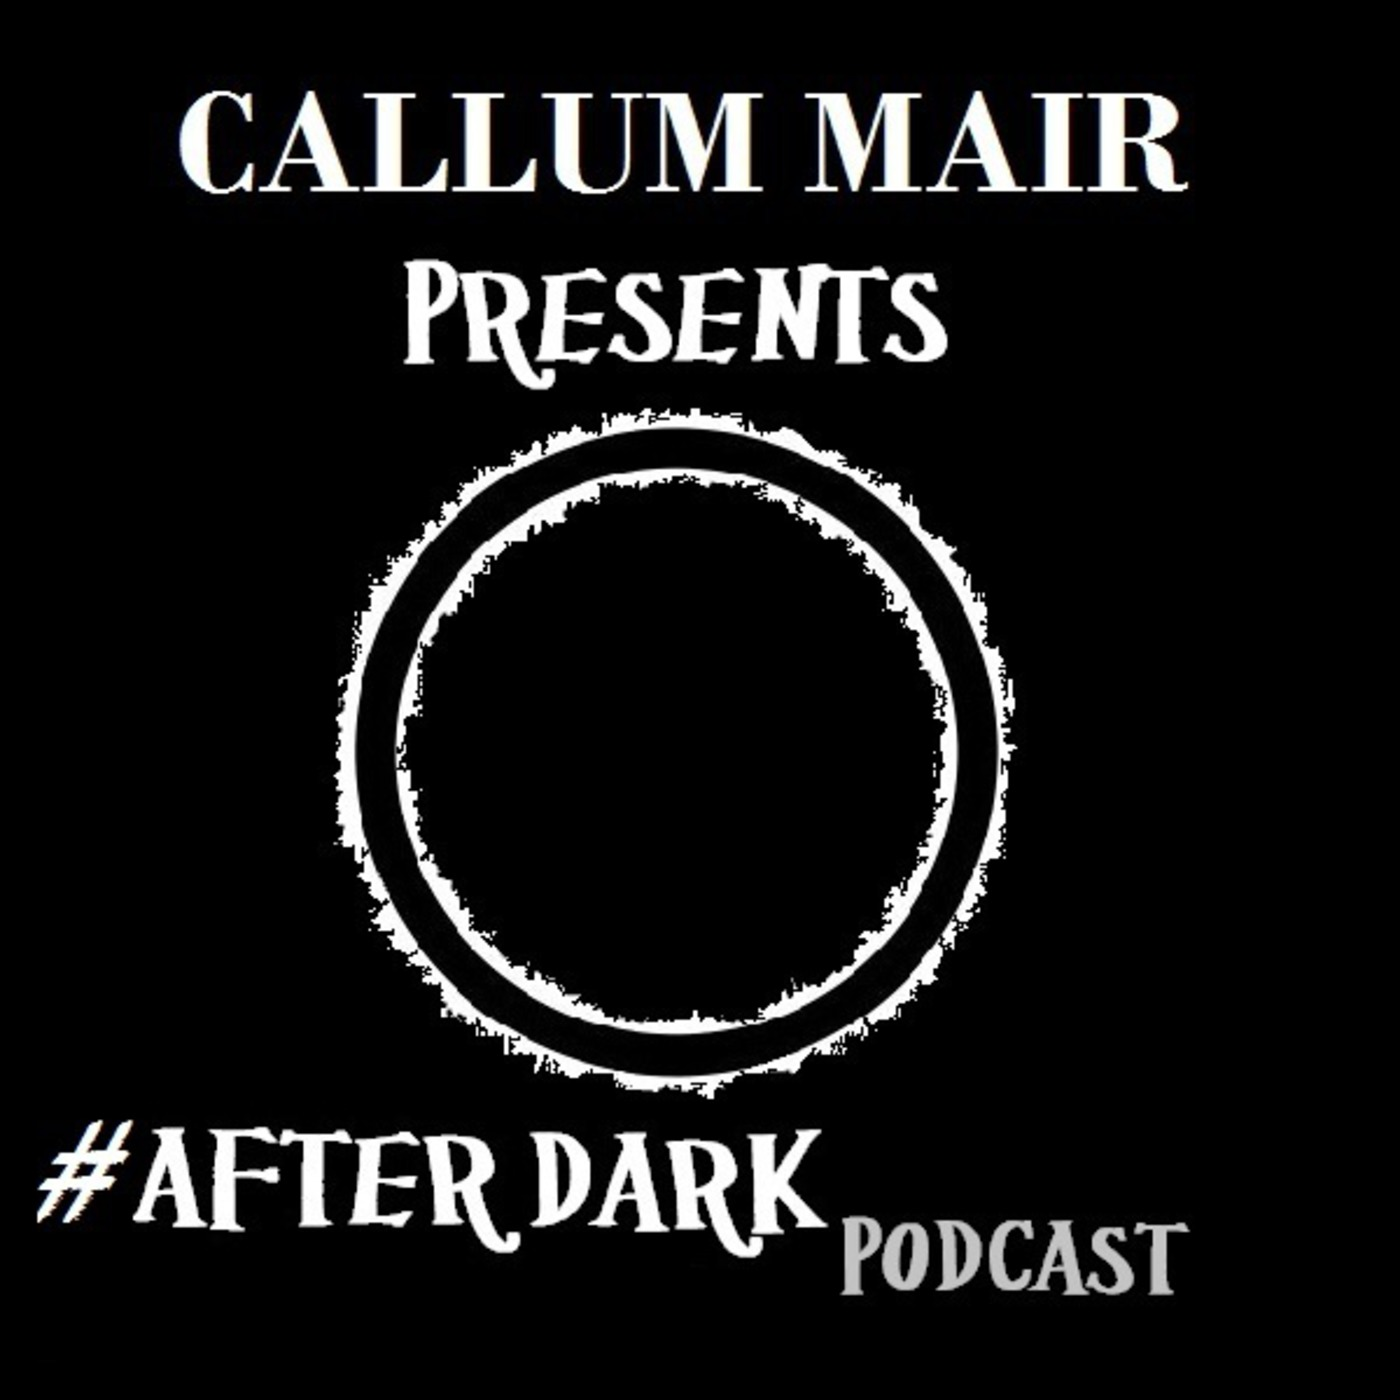 Callum Mair Present's #AfterDark